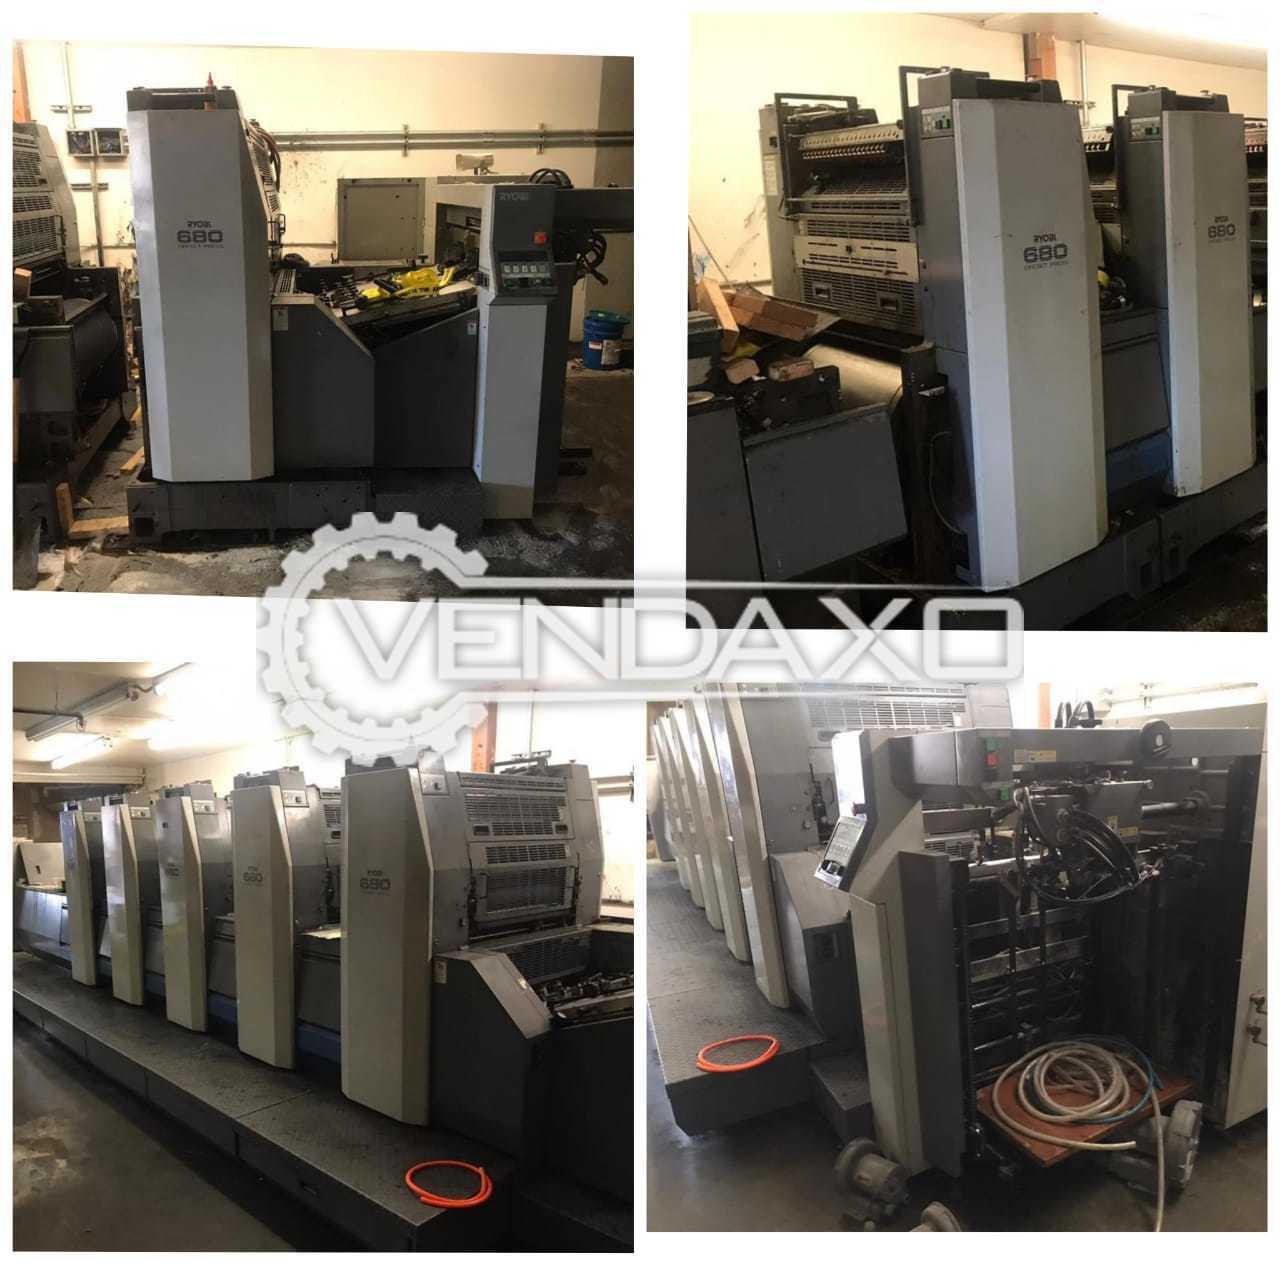 Ryobi 685 Offset Printing Machine - 19 x 26 Inch, 5 Color